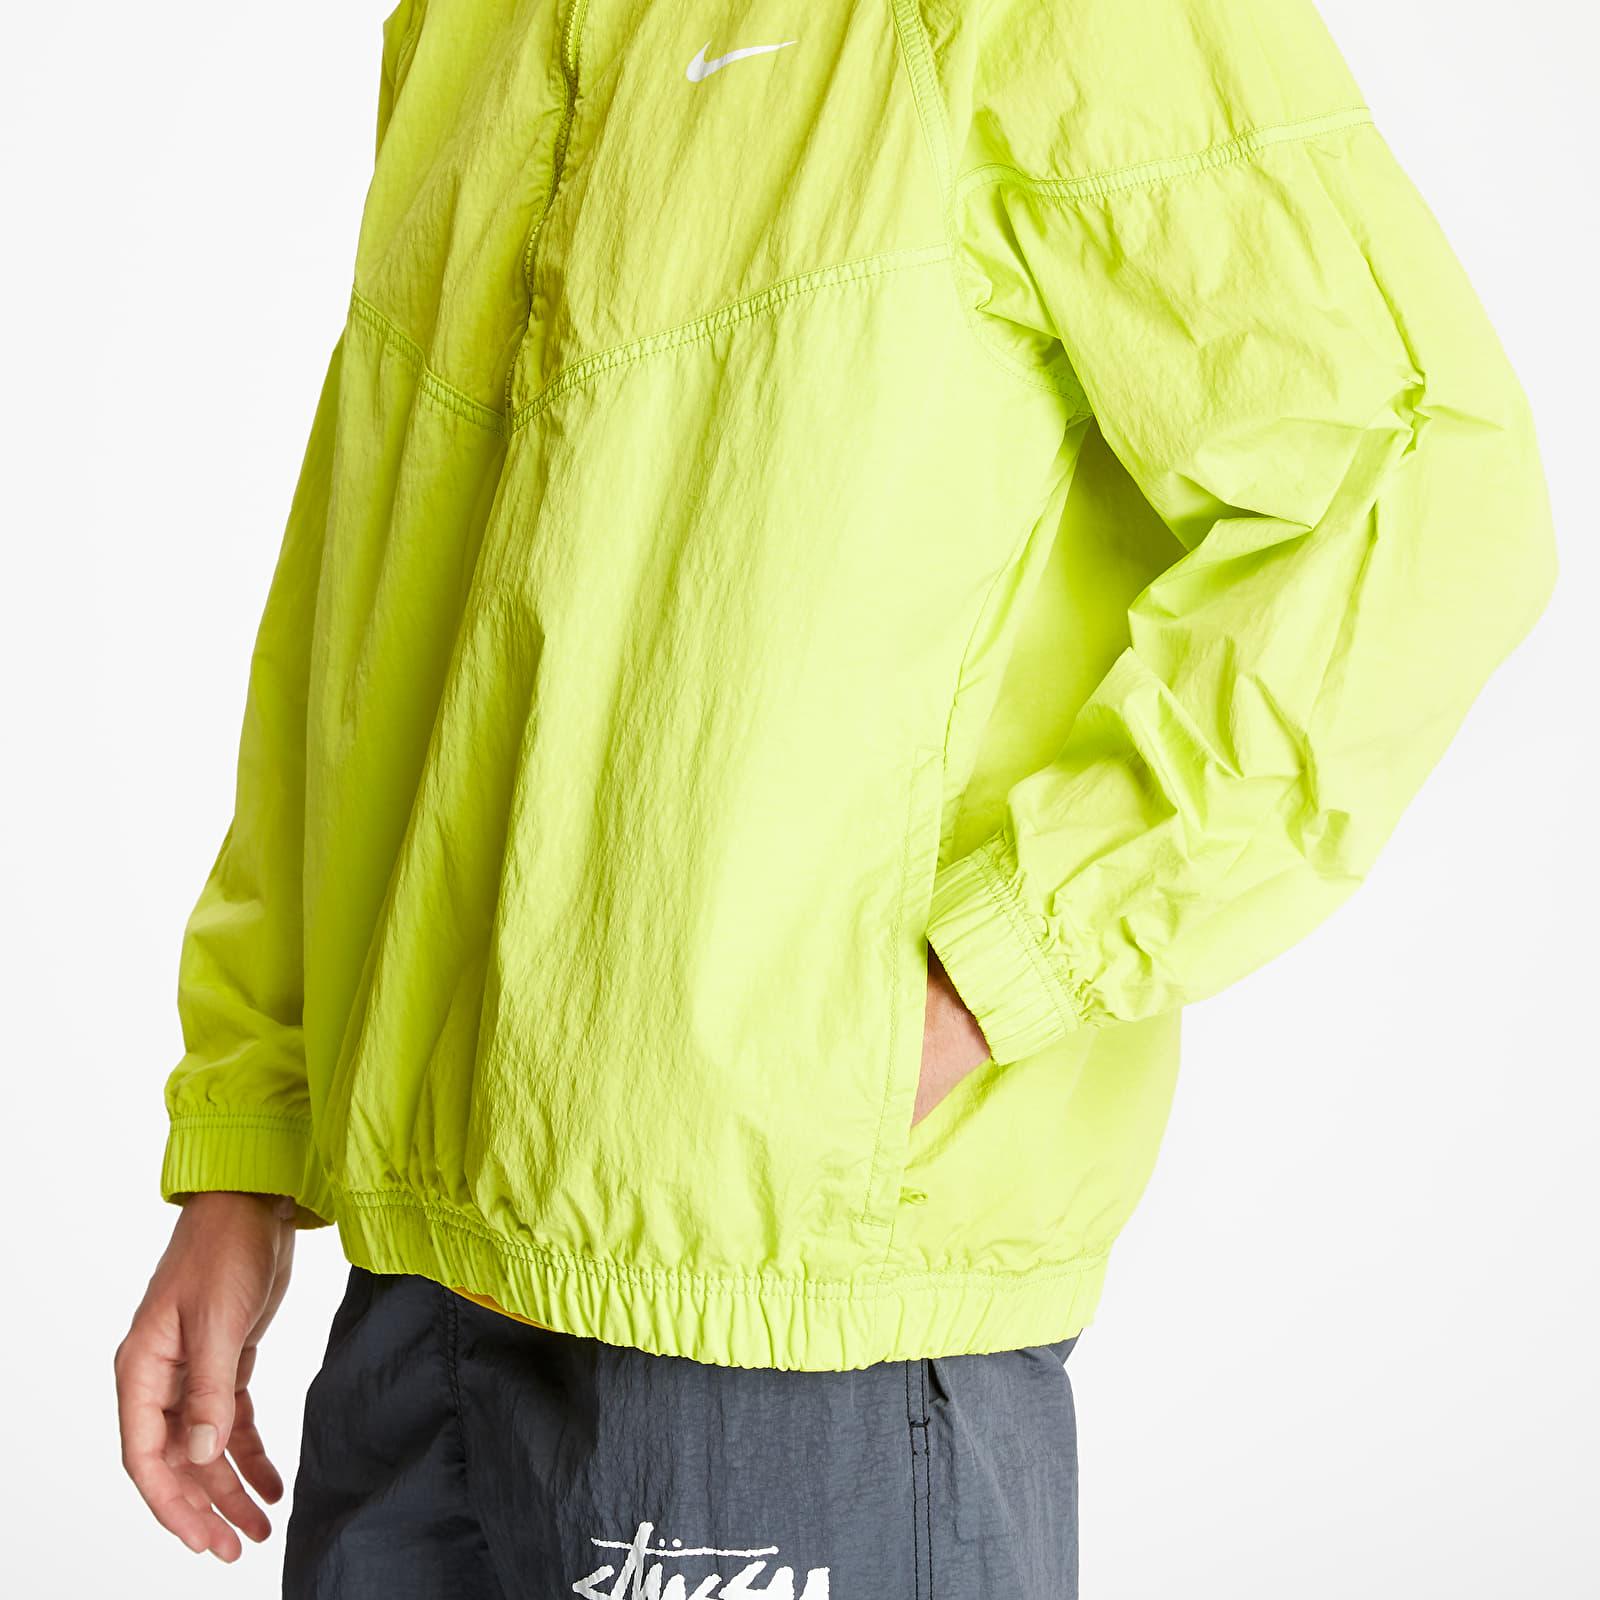 Nike x Stüssy NRG BR Windrunner Jacket Bright Cactus, Green